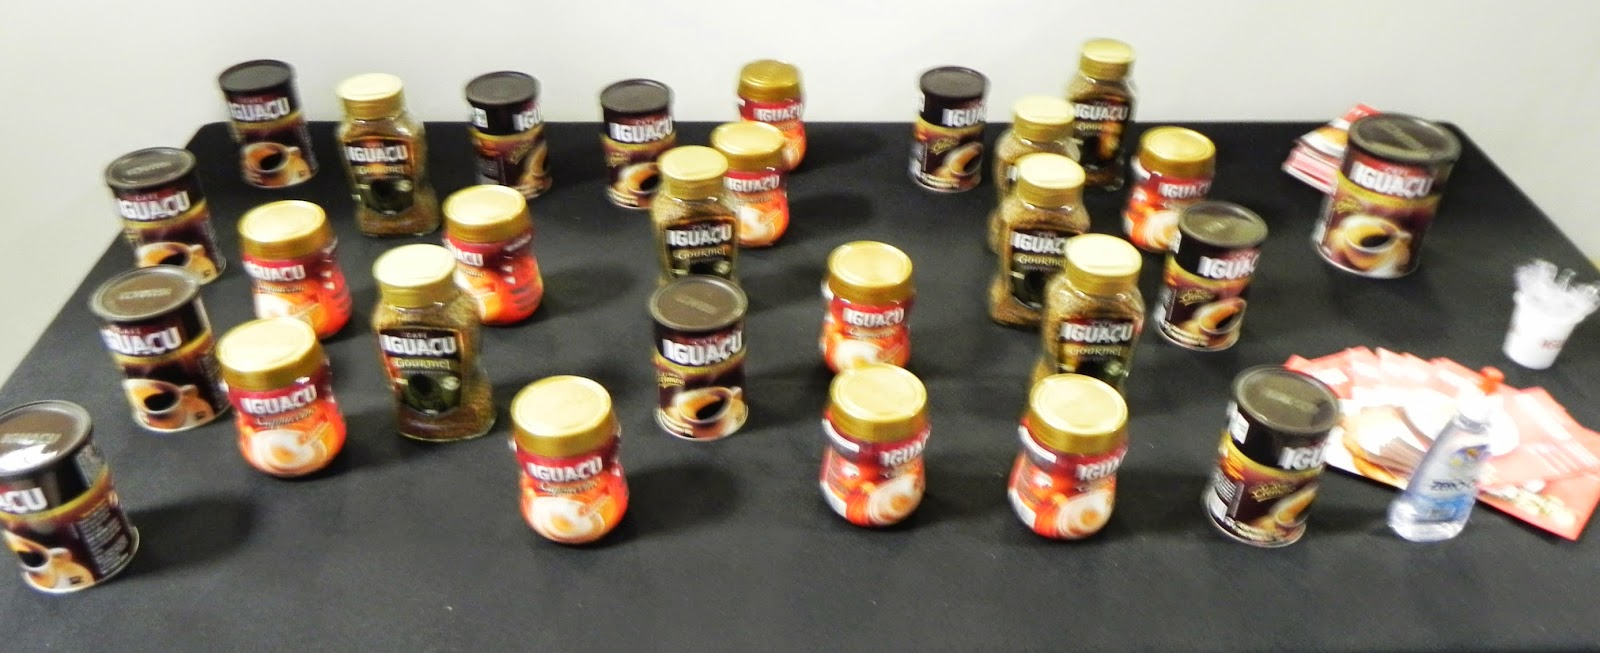 produtos iguaçú - café cappuccino capuccino arábico solúvel